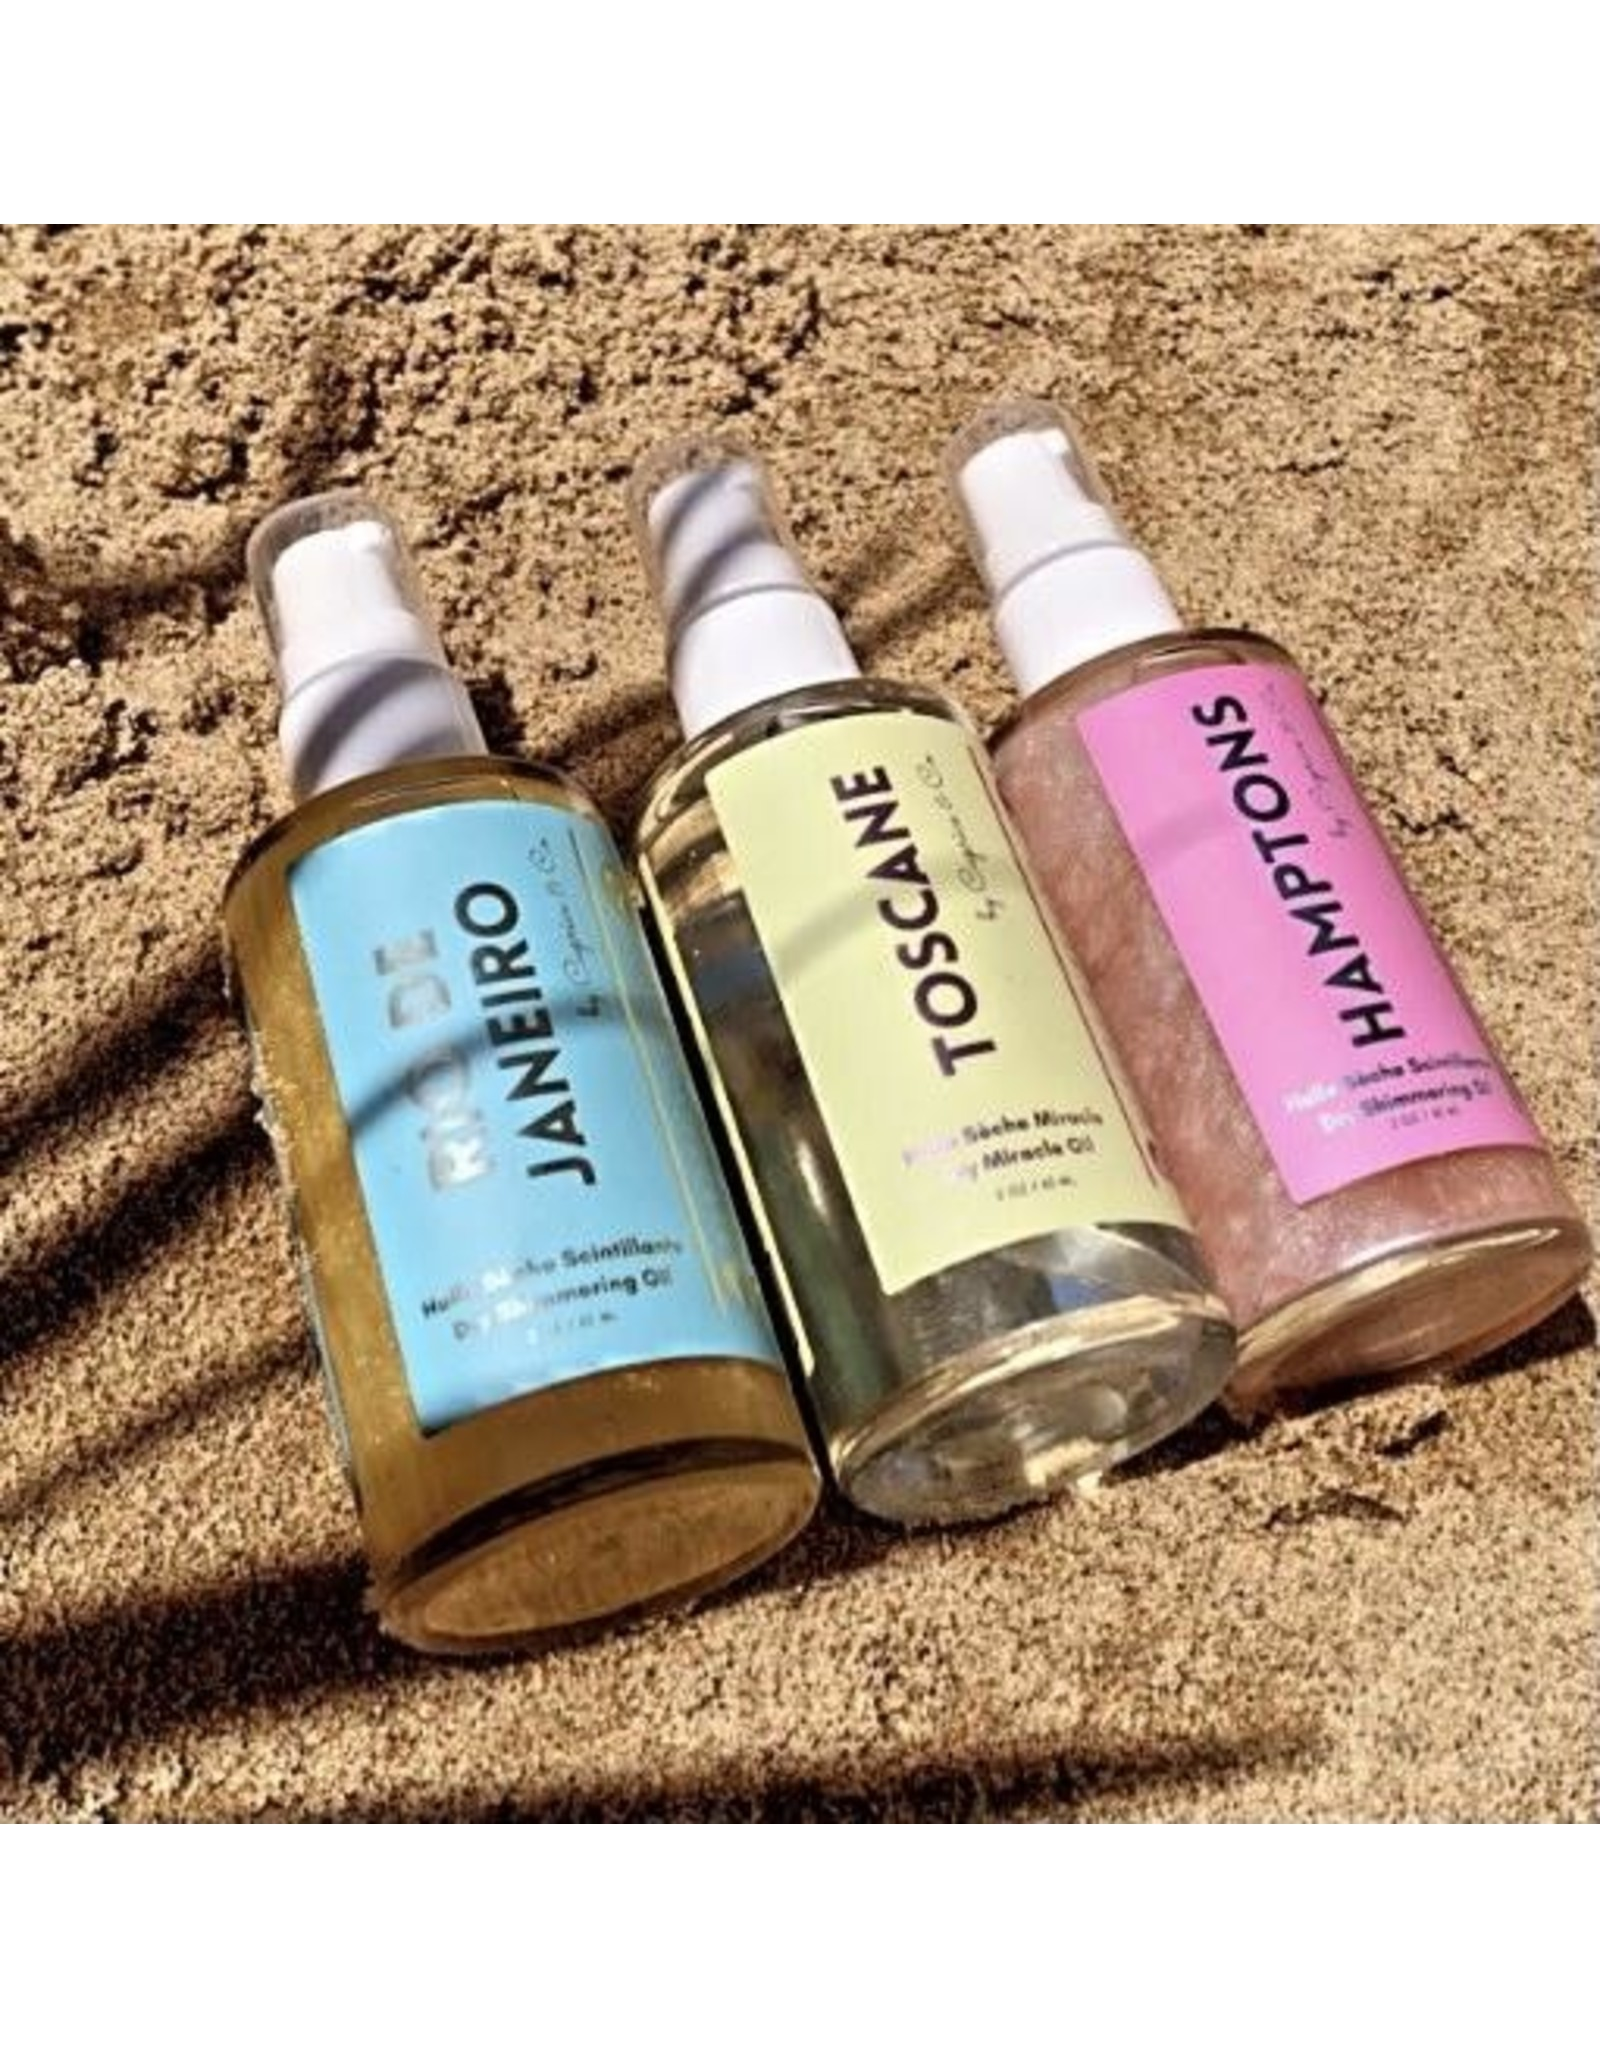 Caprice & Co Dry Shimmering Oil, Hamptons